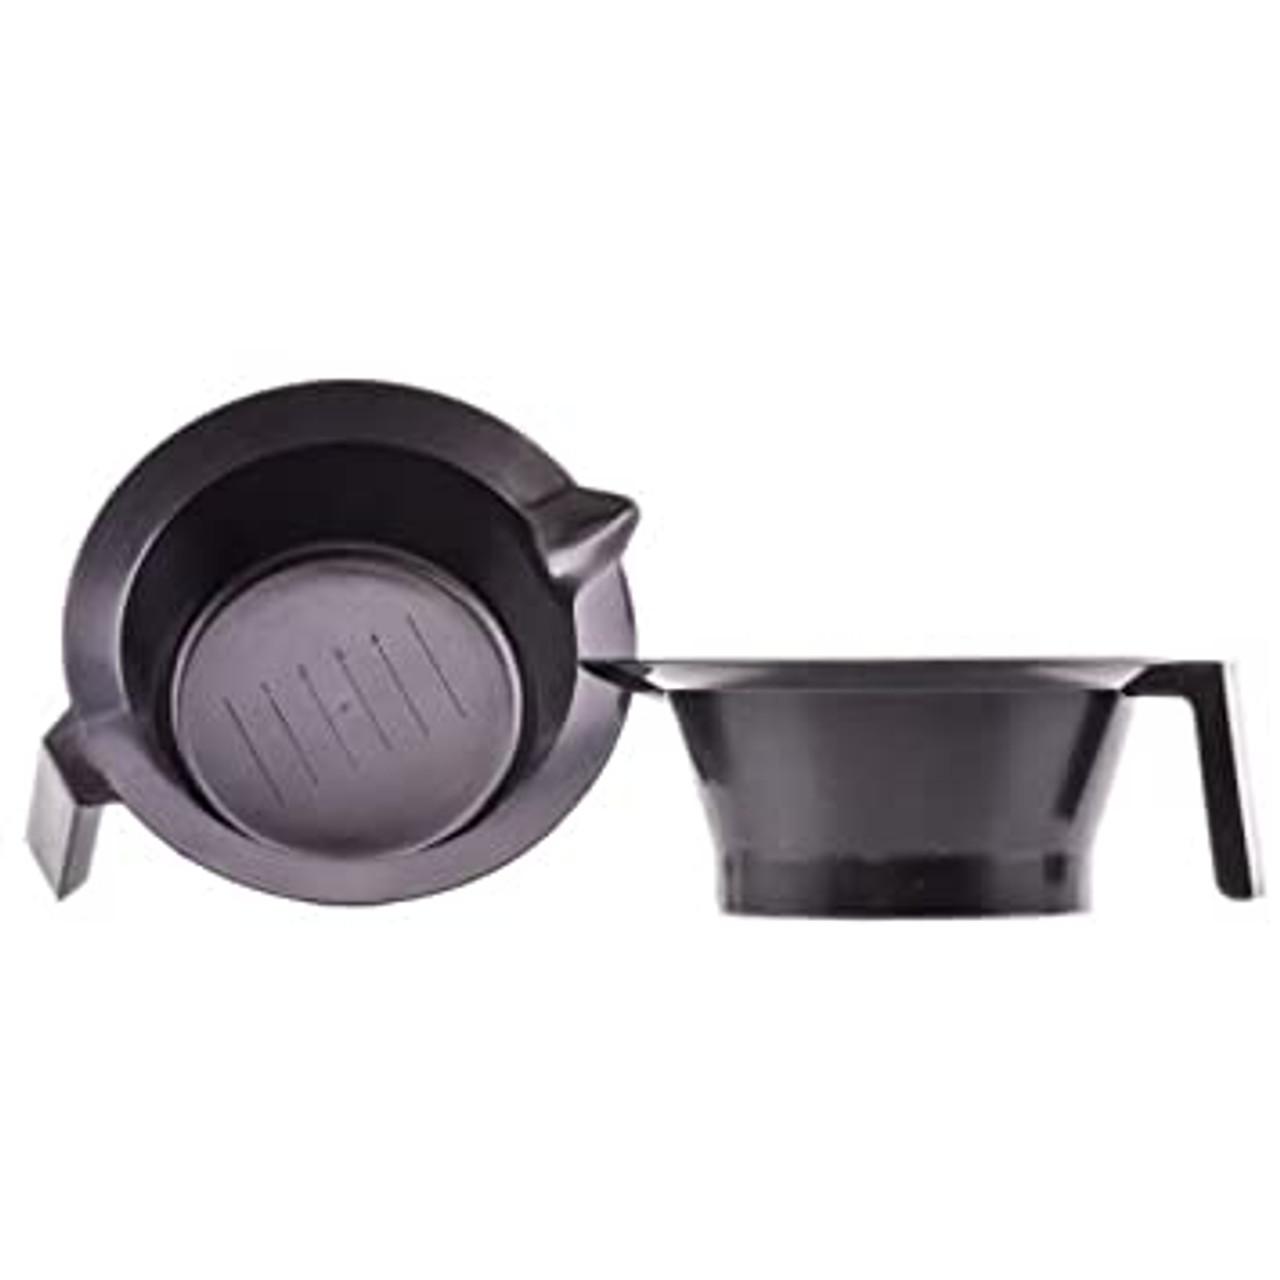 Burmax Tint Bowl